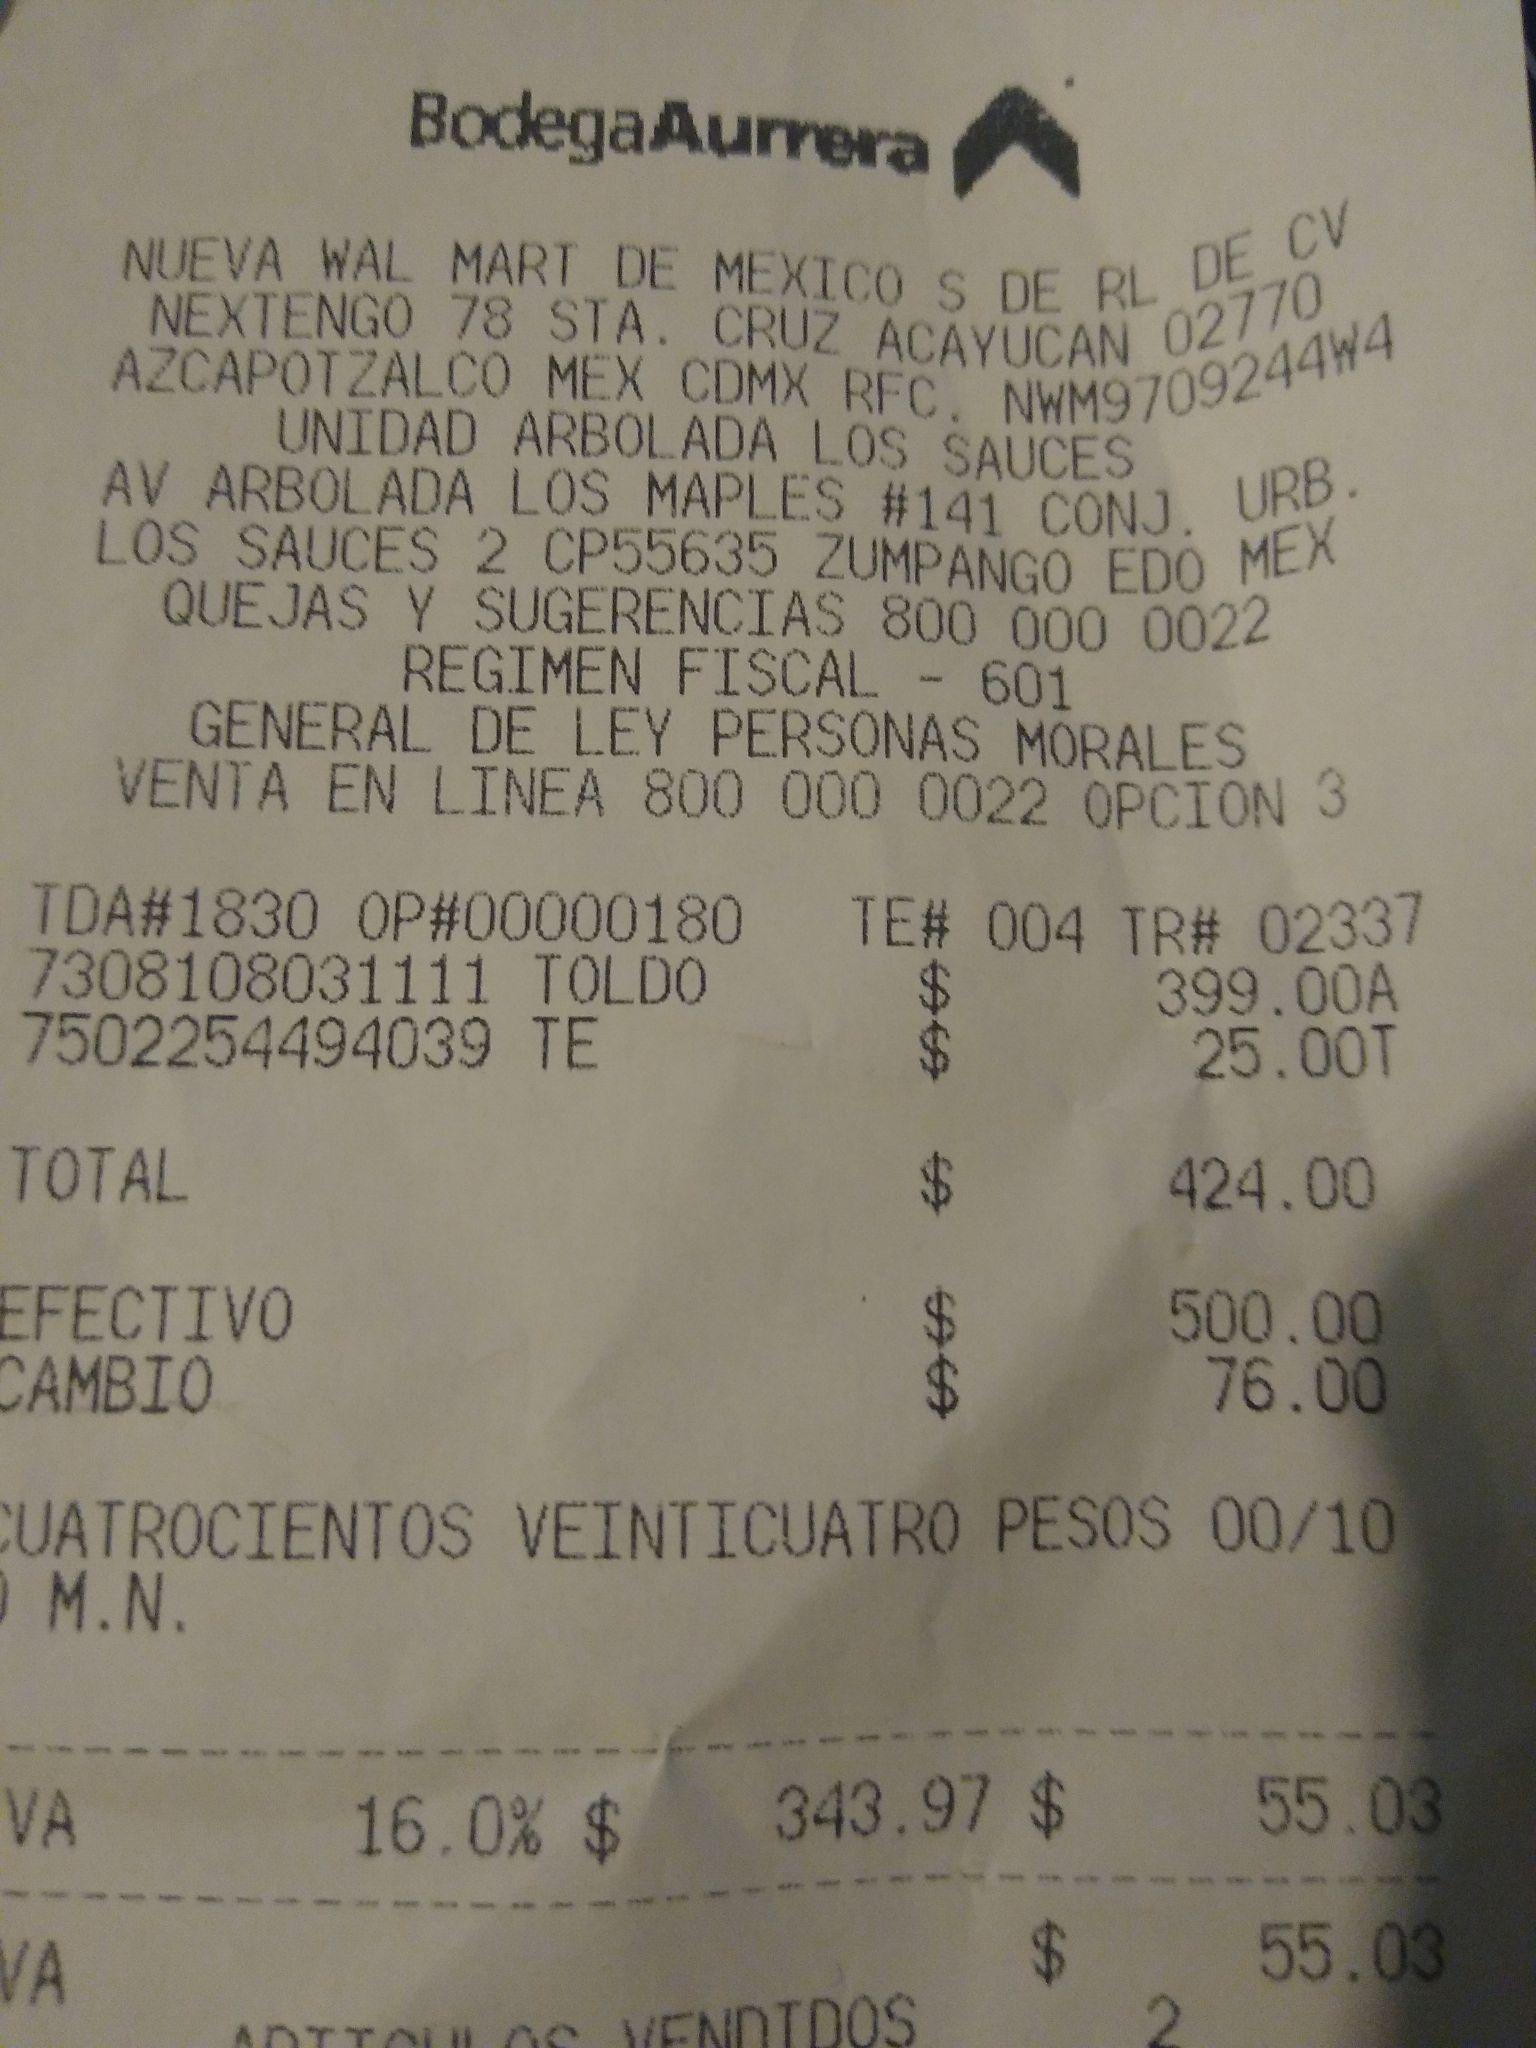 Bodega Aurrerá Sauces Zumpango: Toldo Maimstays 2.4 x 2.4